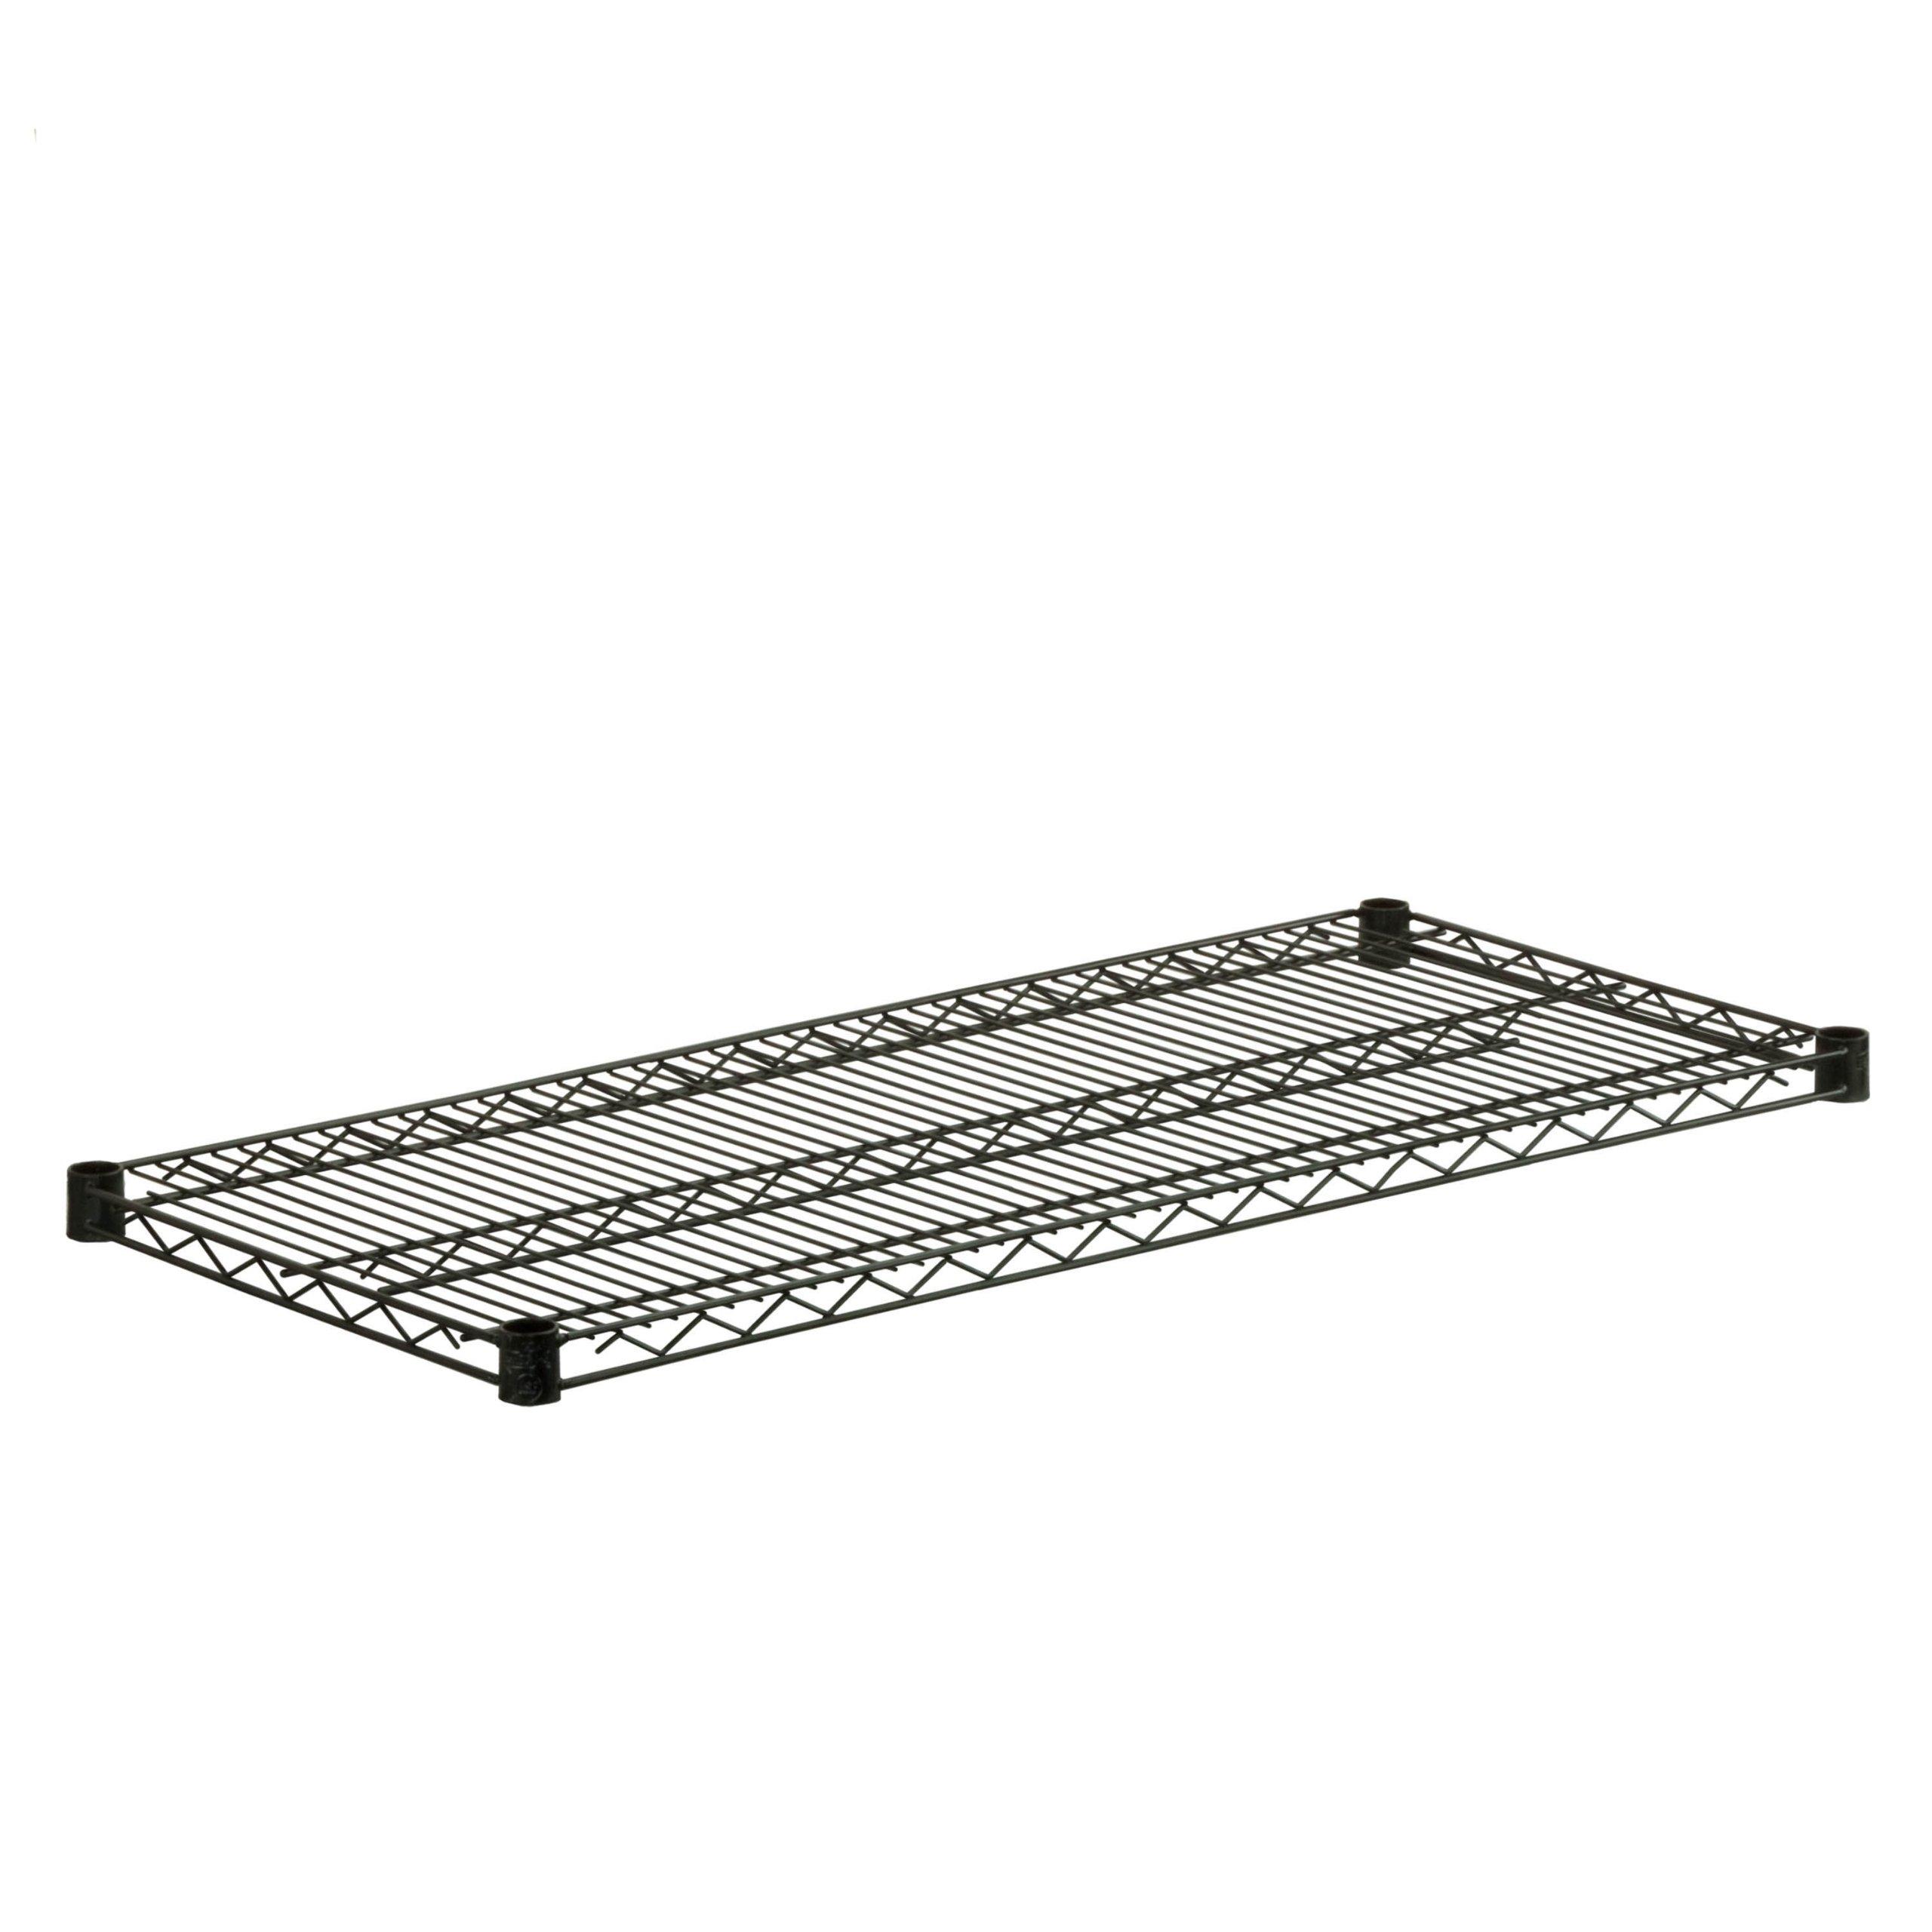 Honey-Can-Do SHF800B1842 Steel Wire Shelf for Urban Shelving Units, 800-Pound Capacity, Black, 18Lx42W